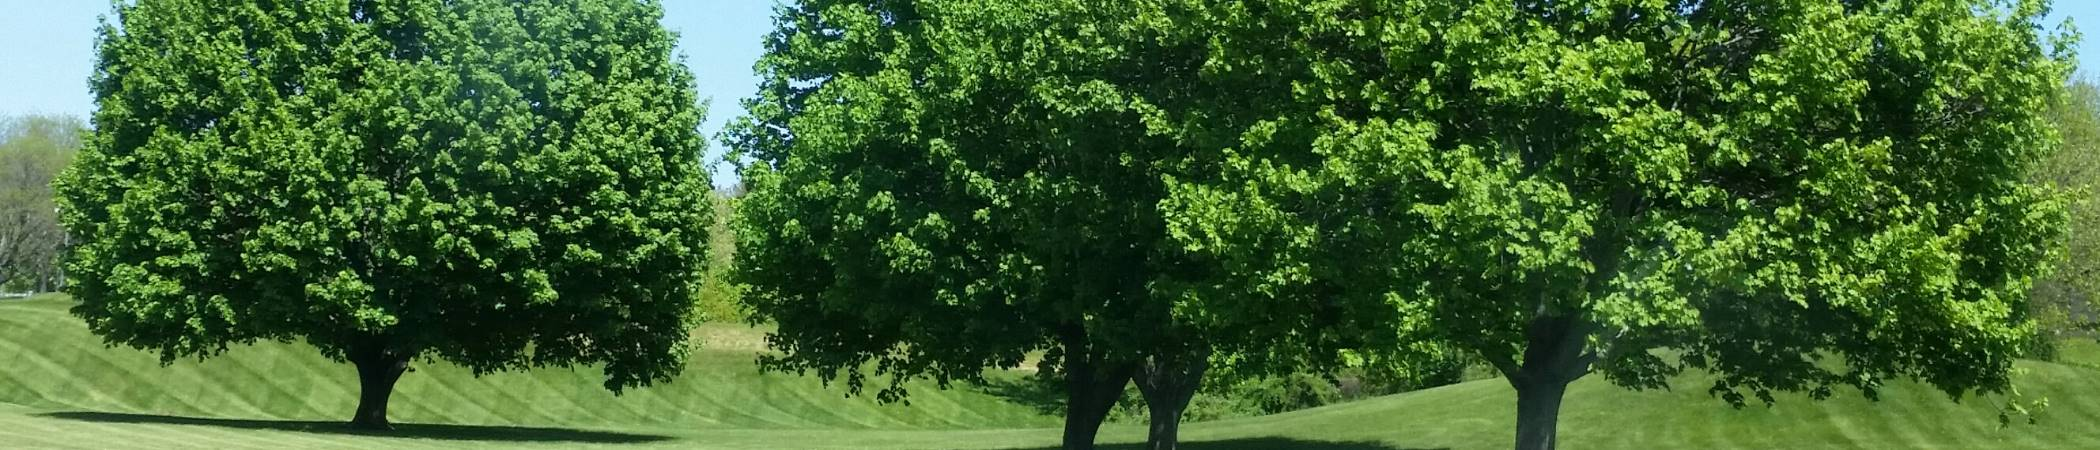 Tatia Winecoff State Farm Insurance (203) 269-9330 Offering Home, Life, Auto Insurance